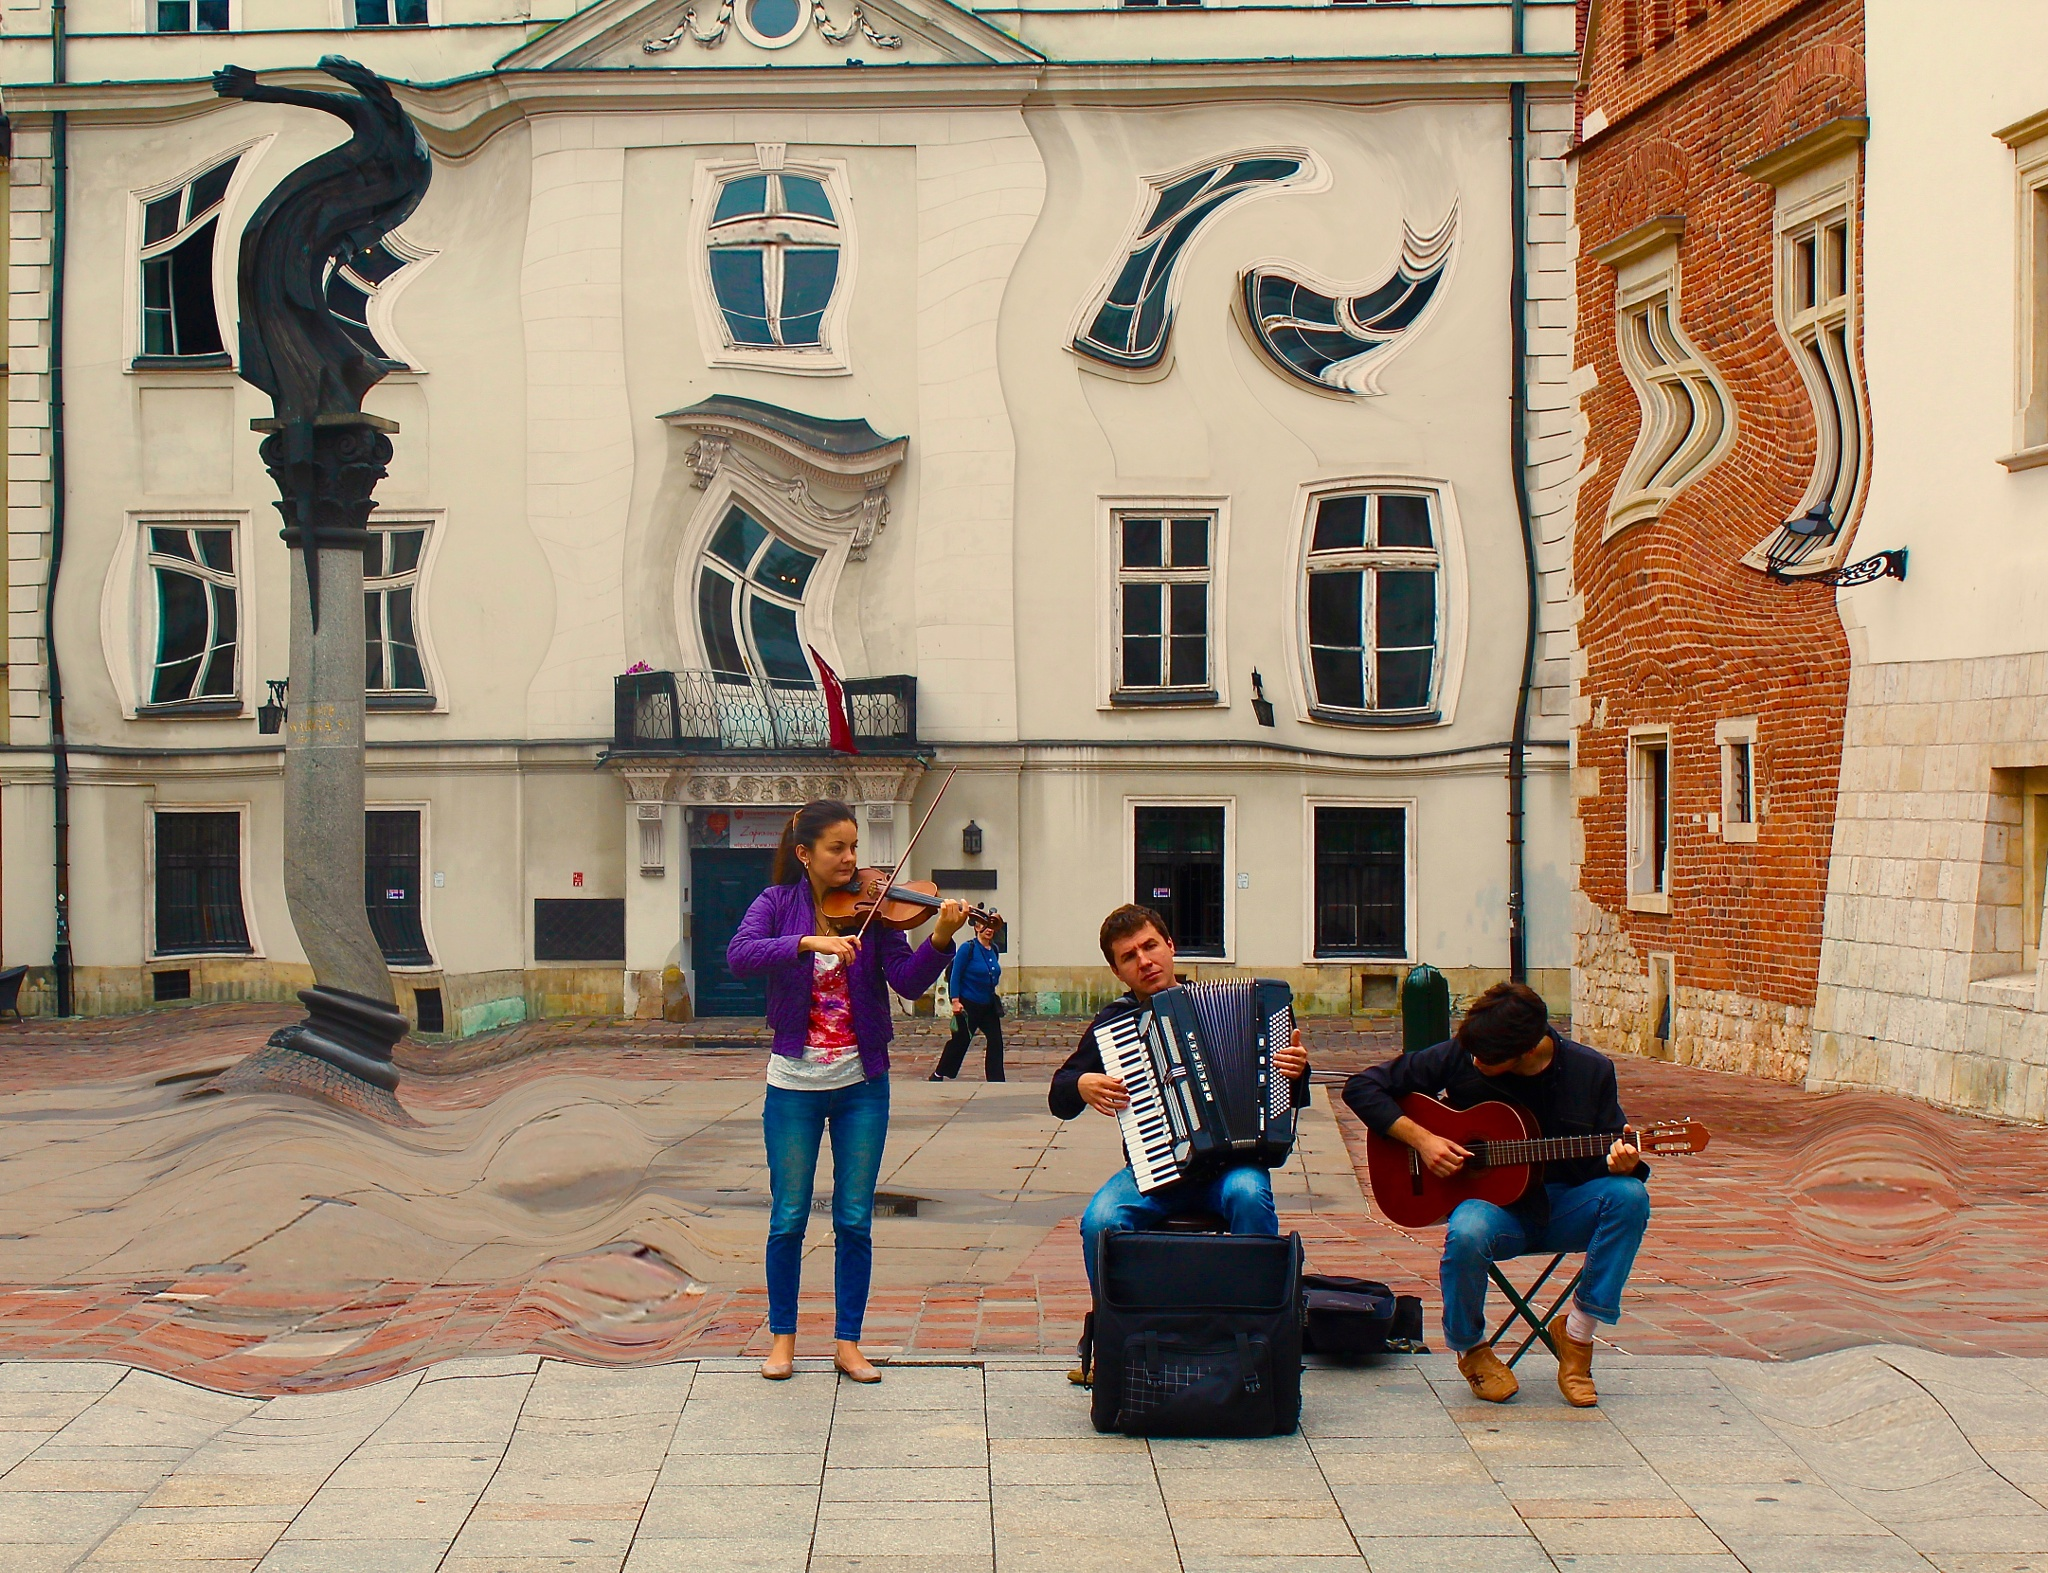 in Poland by waldelbe